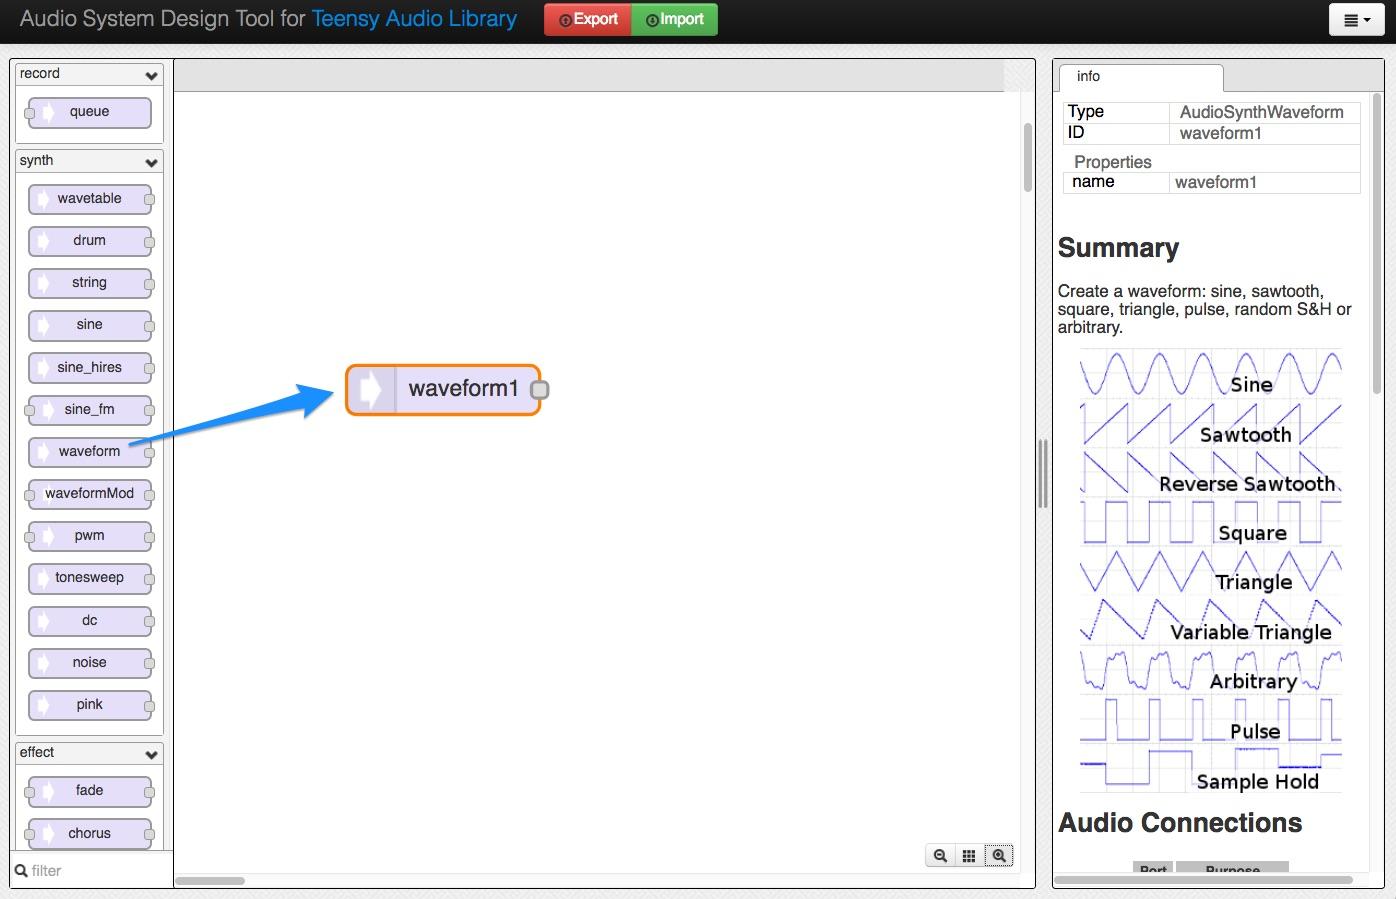 adabox_Audio_System_Design_Tool_for_Teensy_Audio_Library_5.jpg